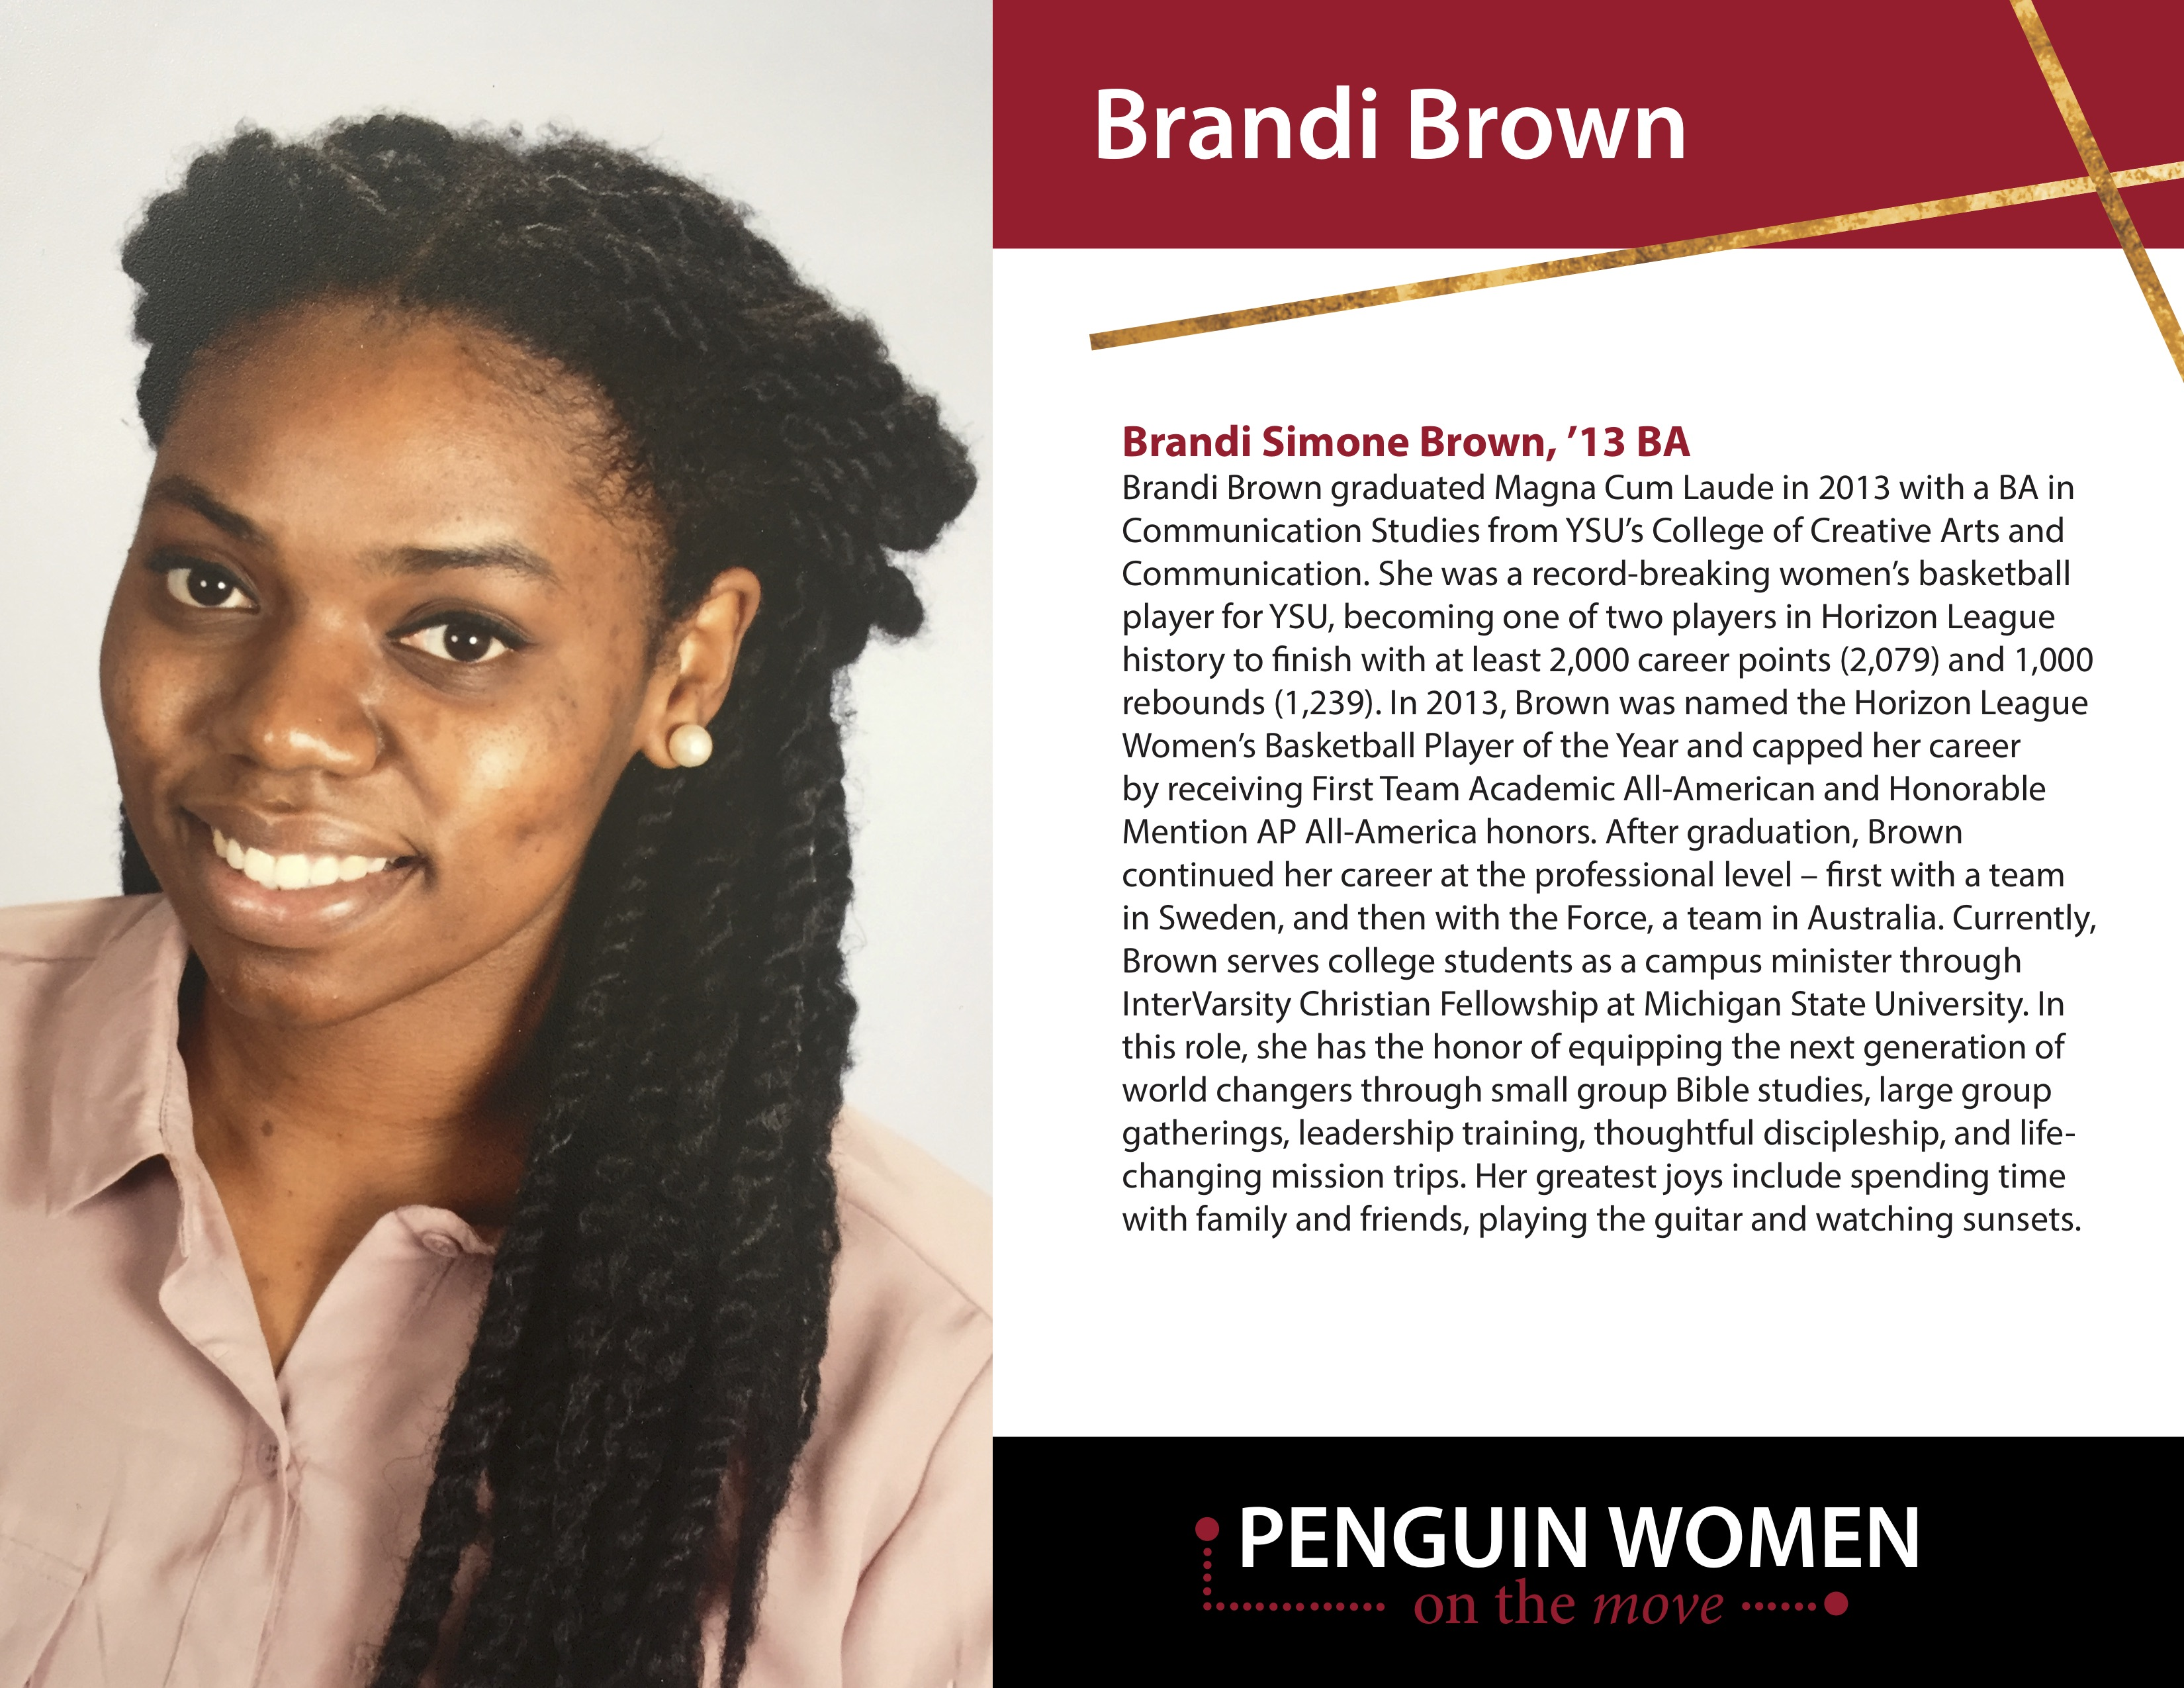 Brandi Brown